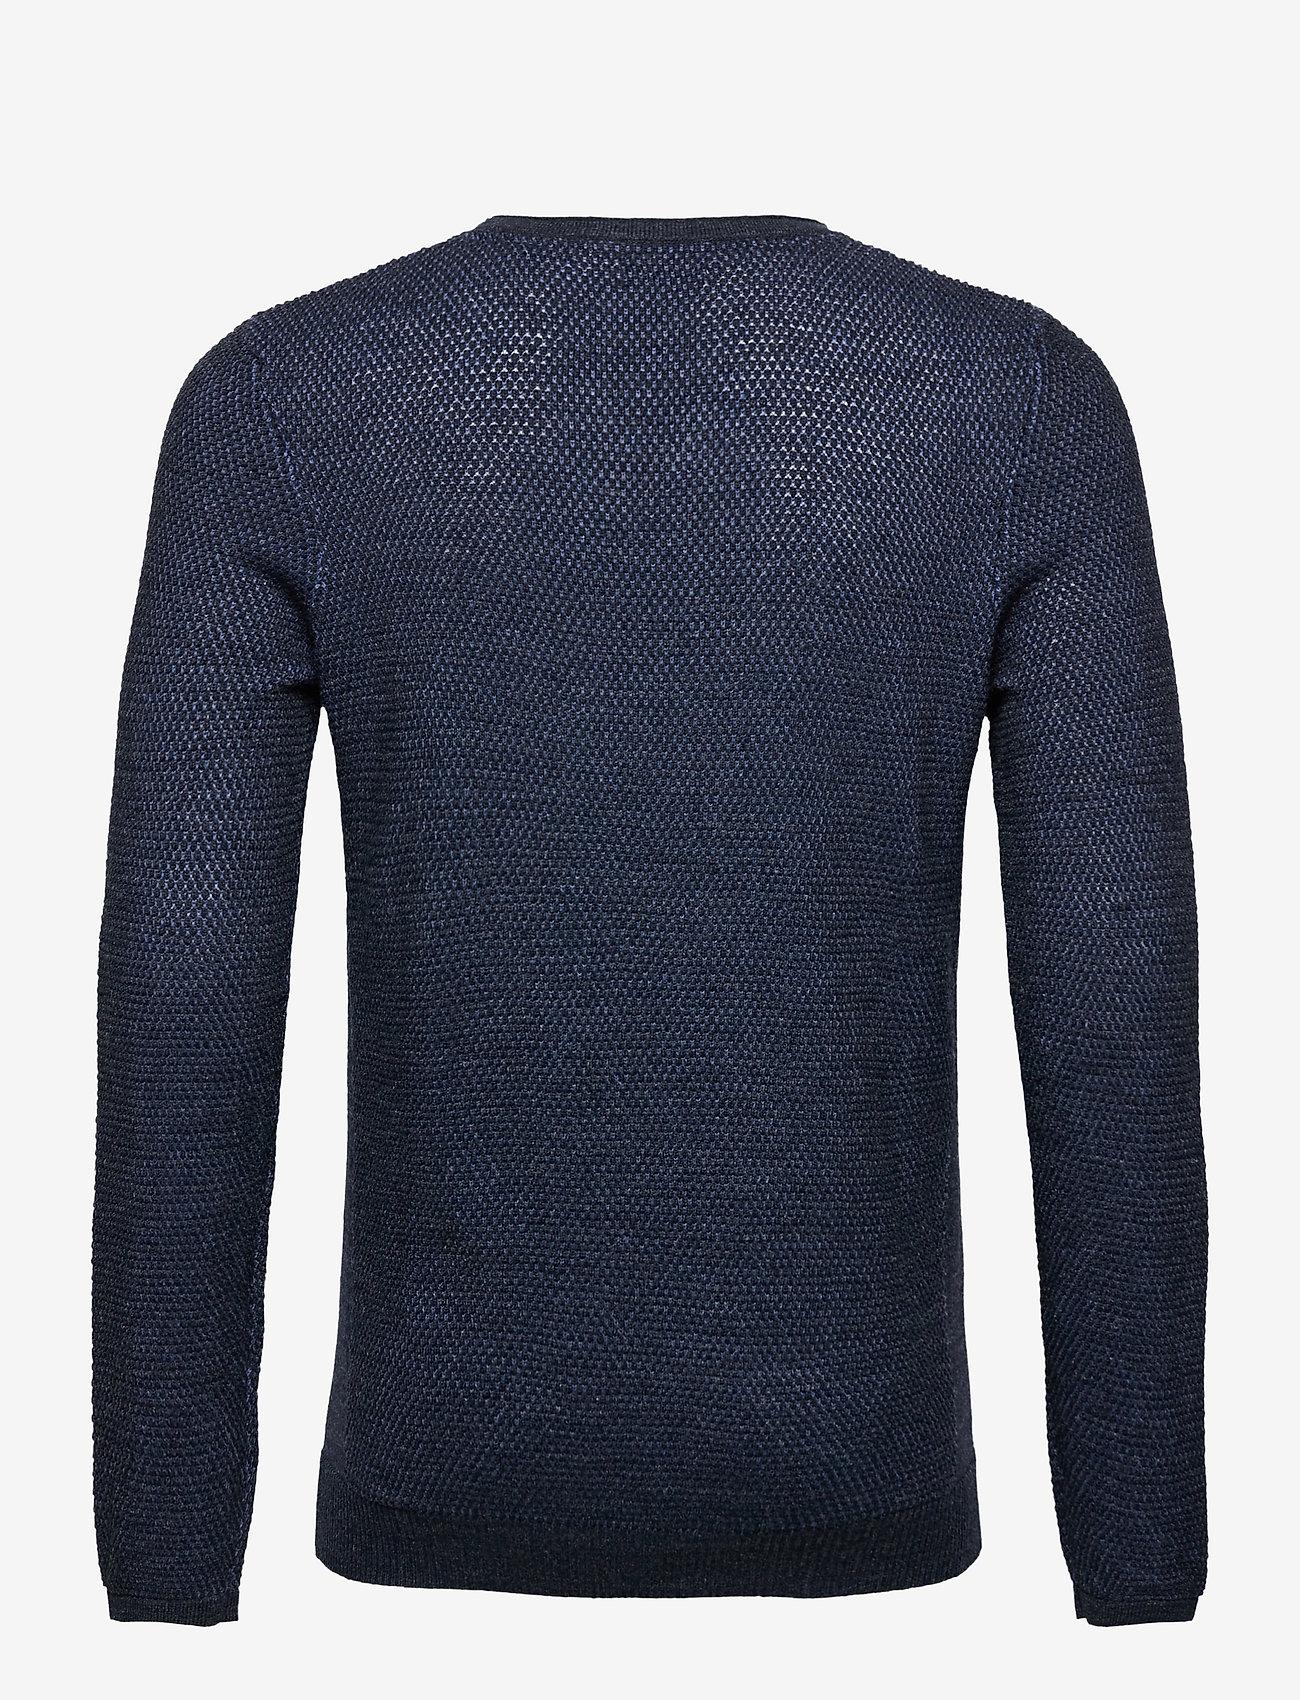 Tom Tailor sweater mini - Sweatshirts NAVY GREY PLATED - Menn Klær